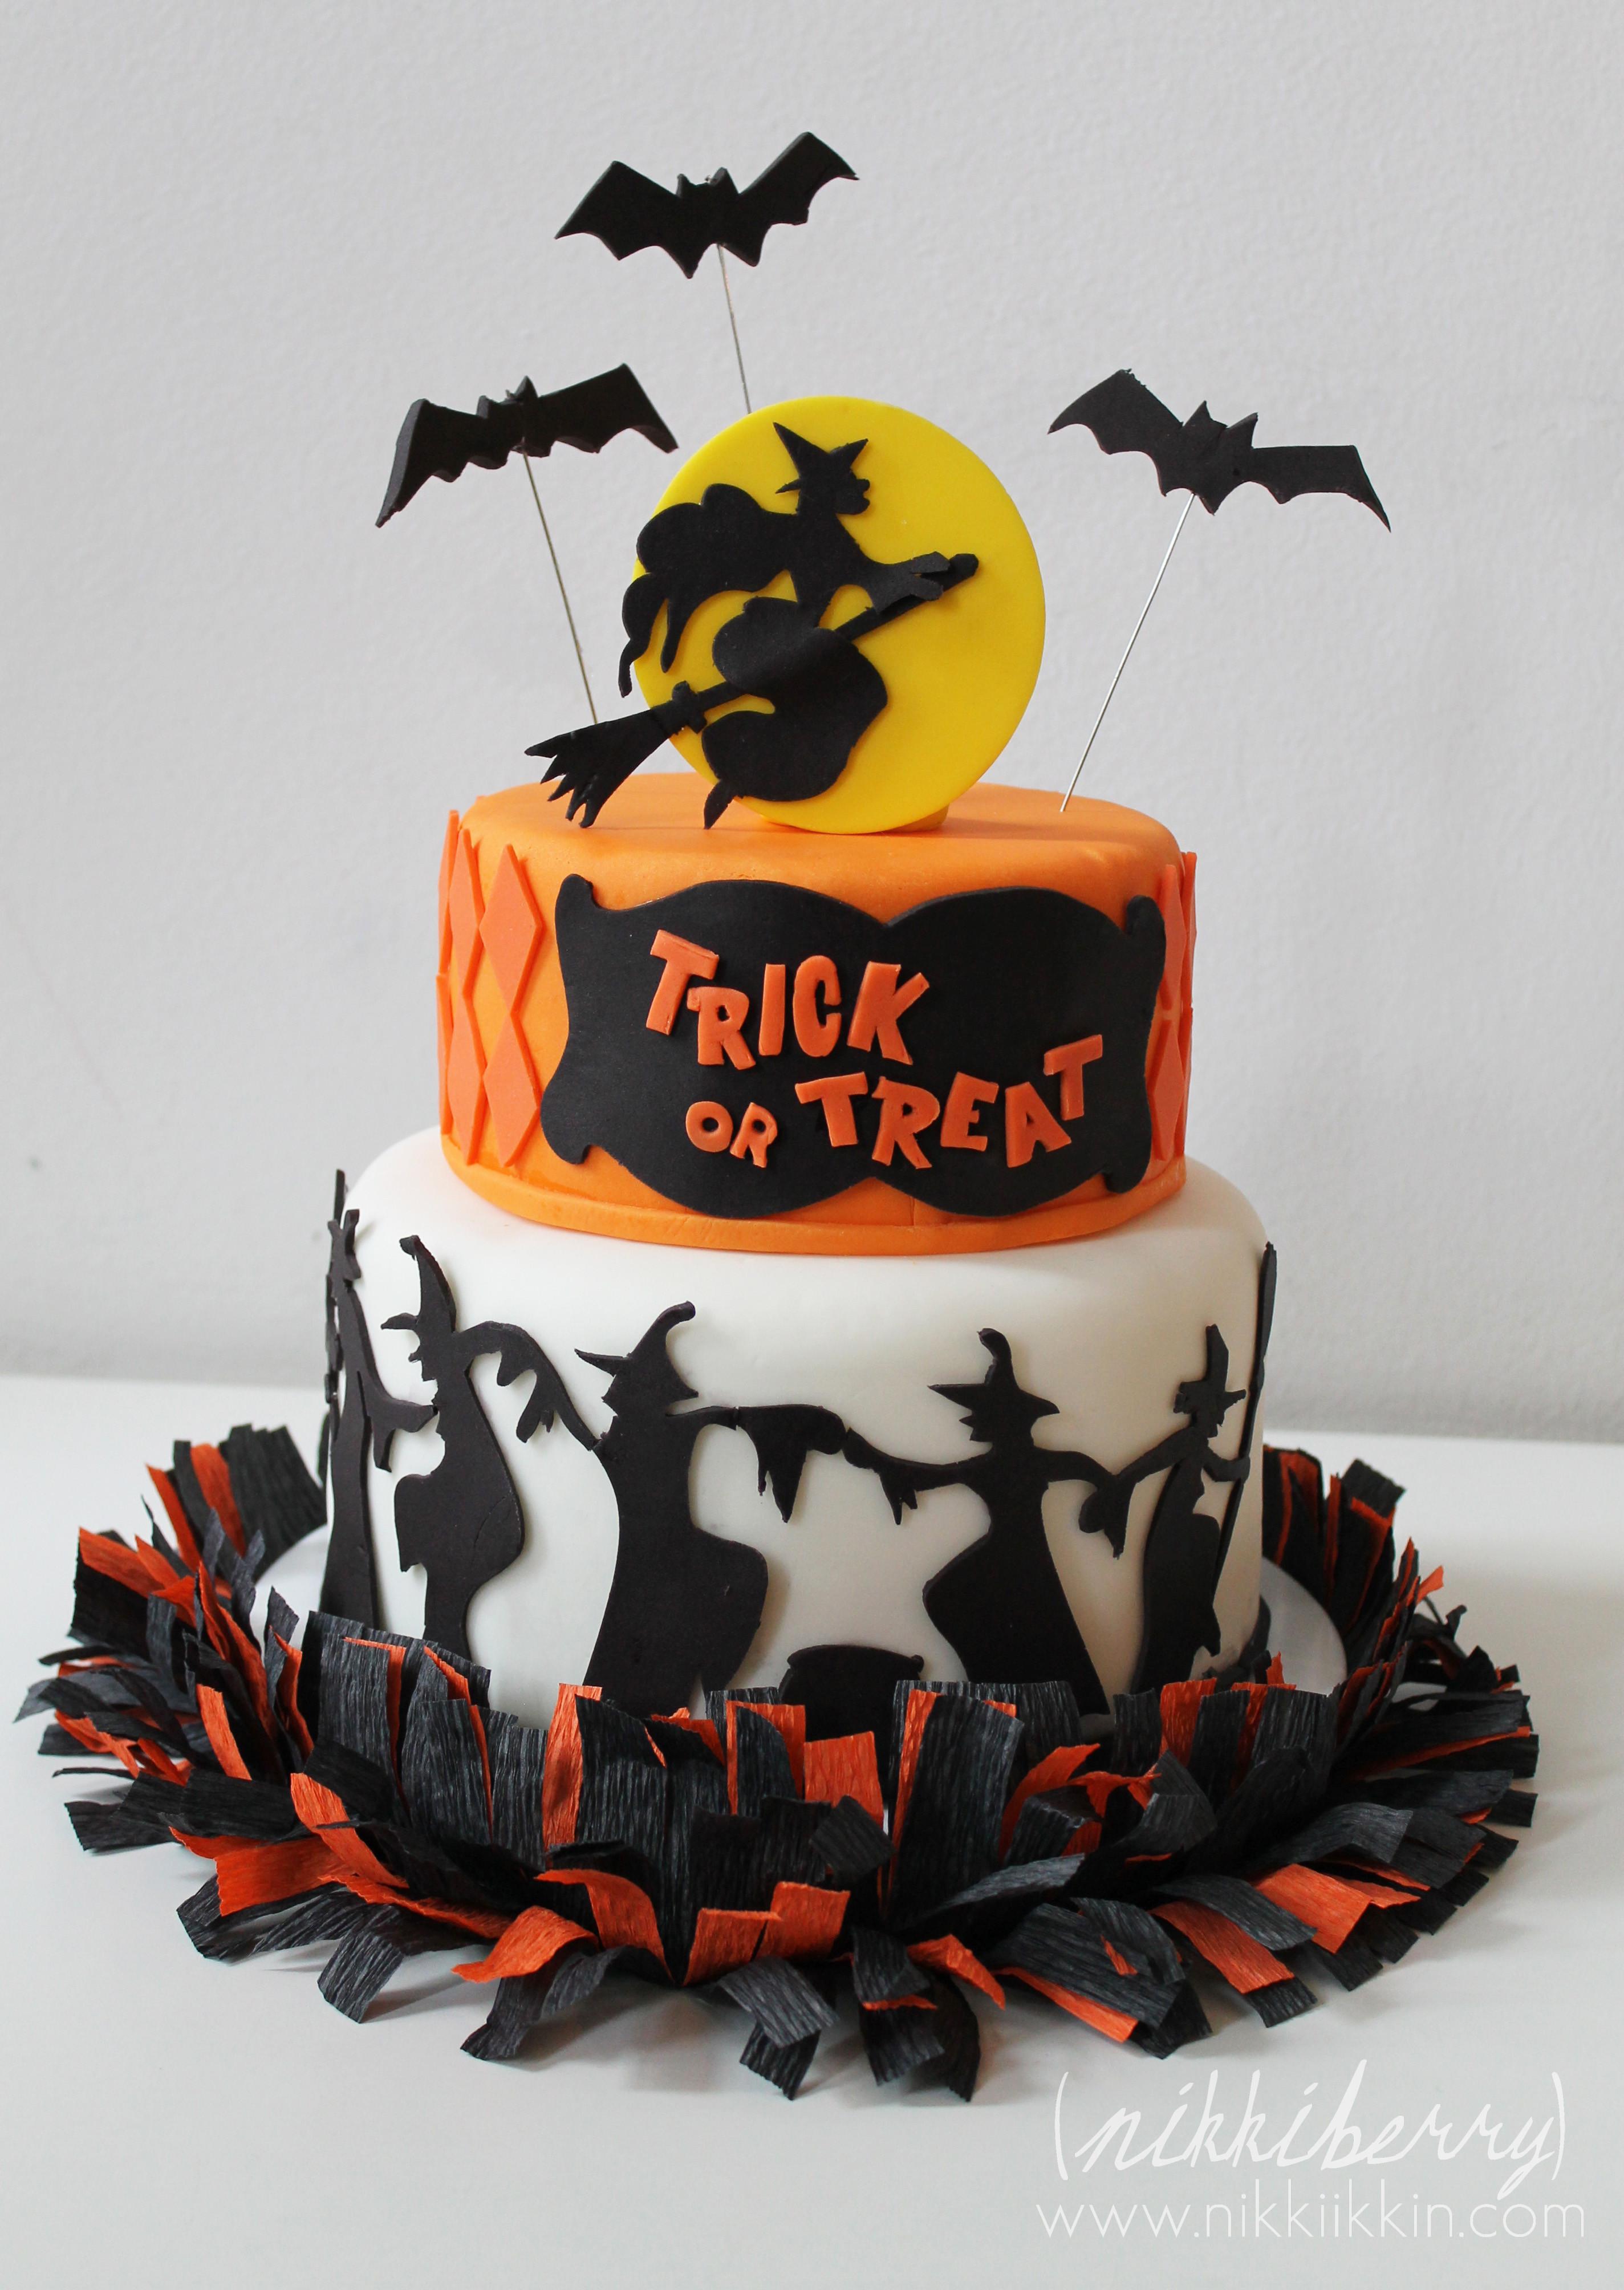 Halloween Cakes Decorations Ideas  Halloween Cakes – Decoration Ideas